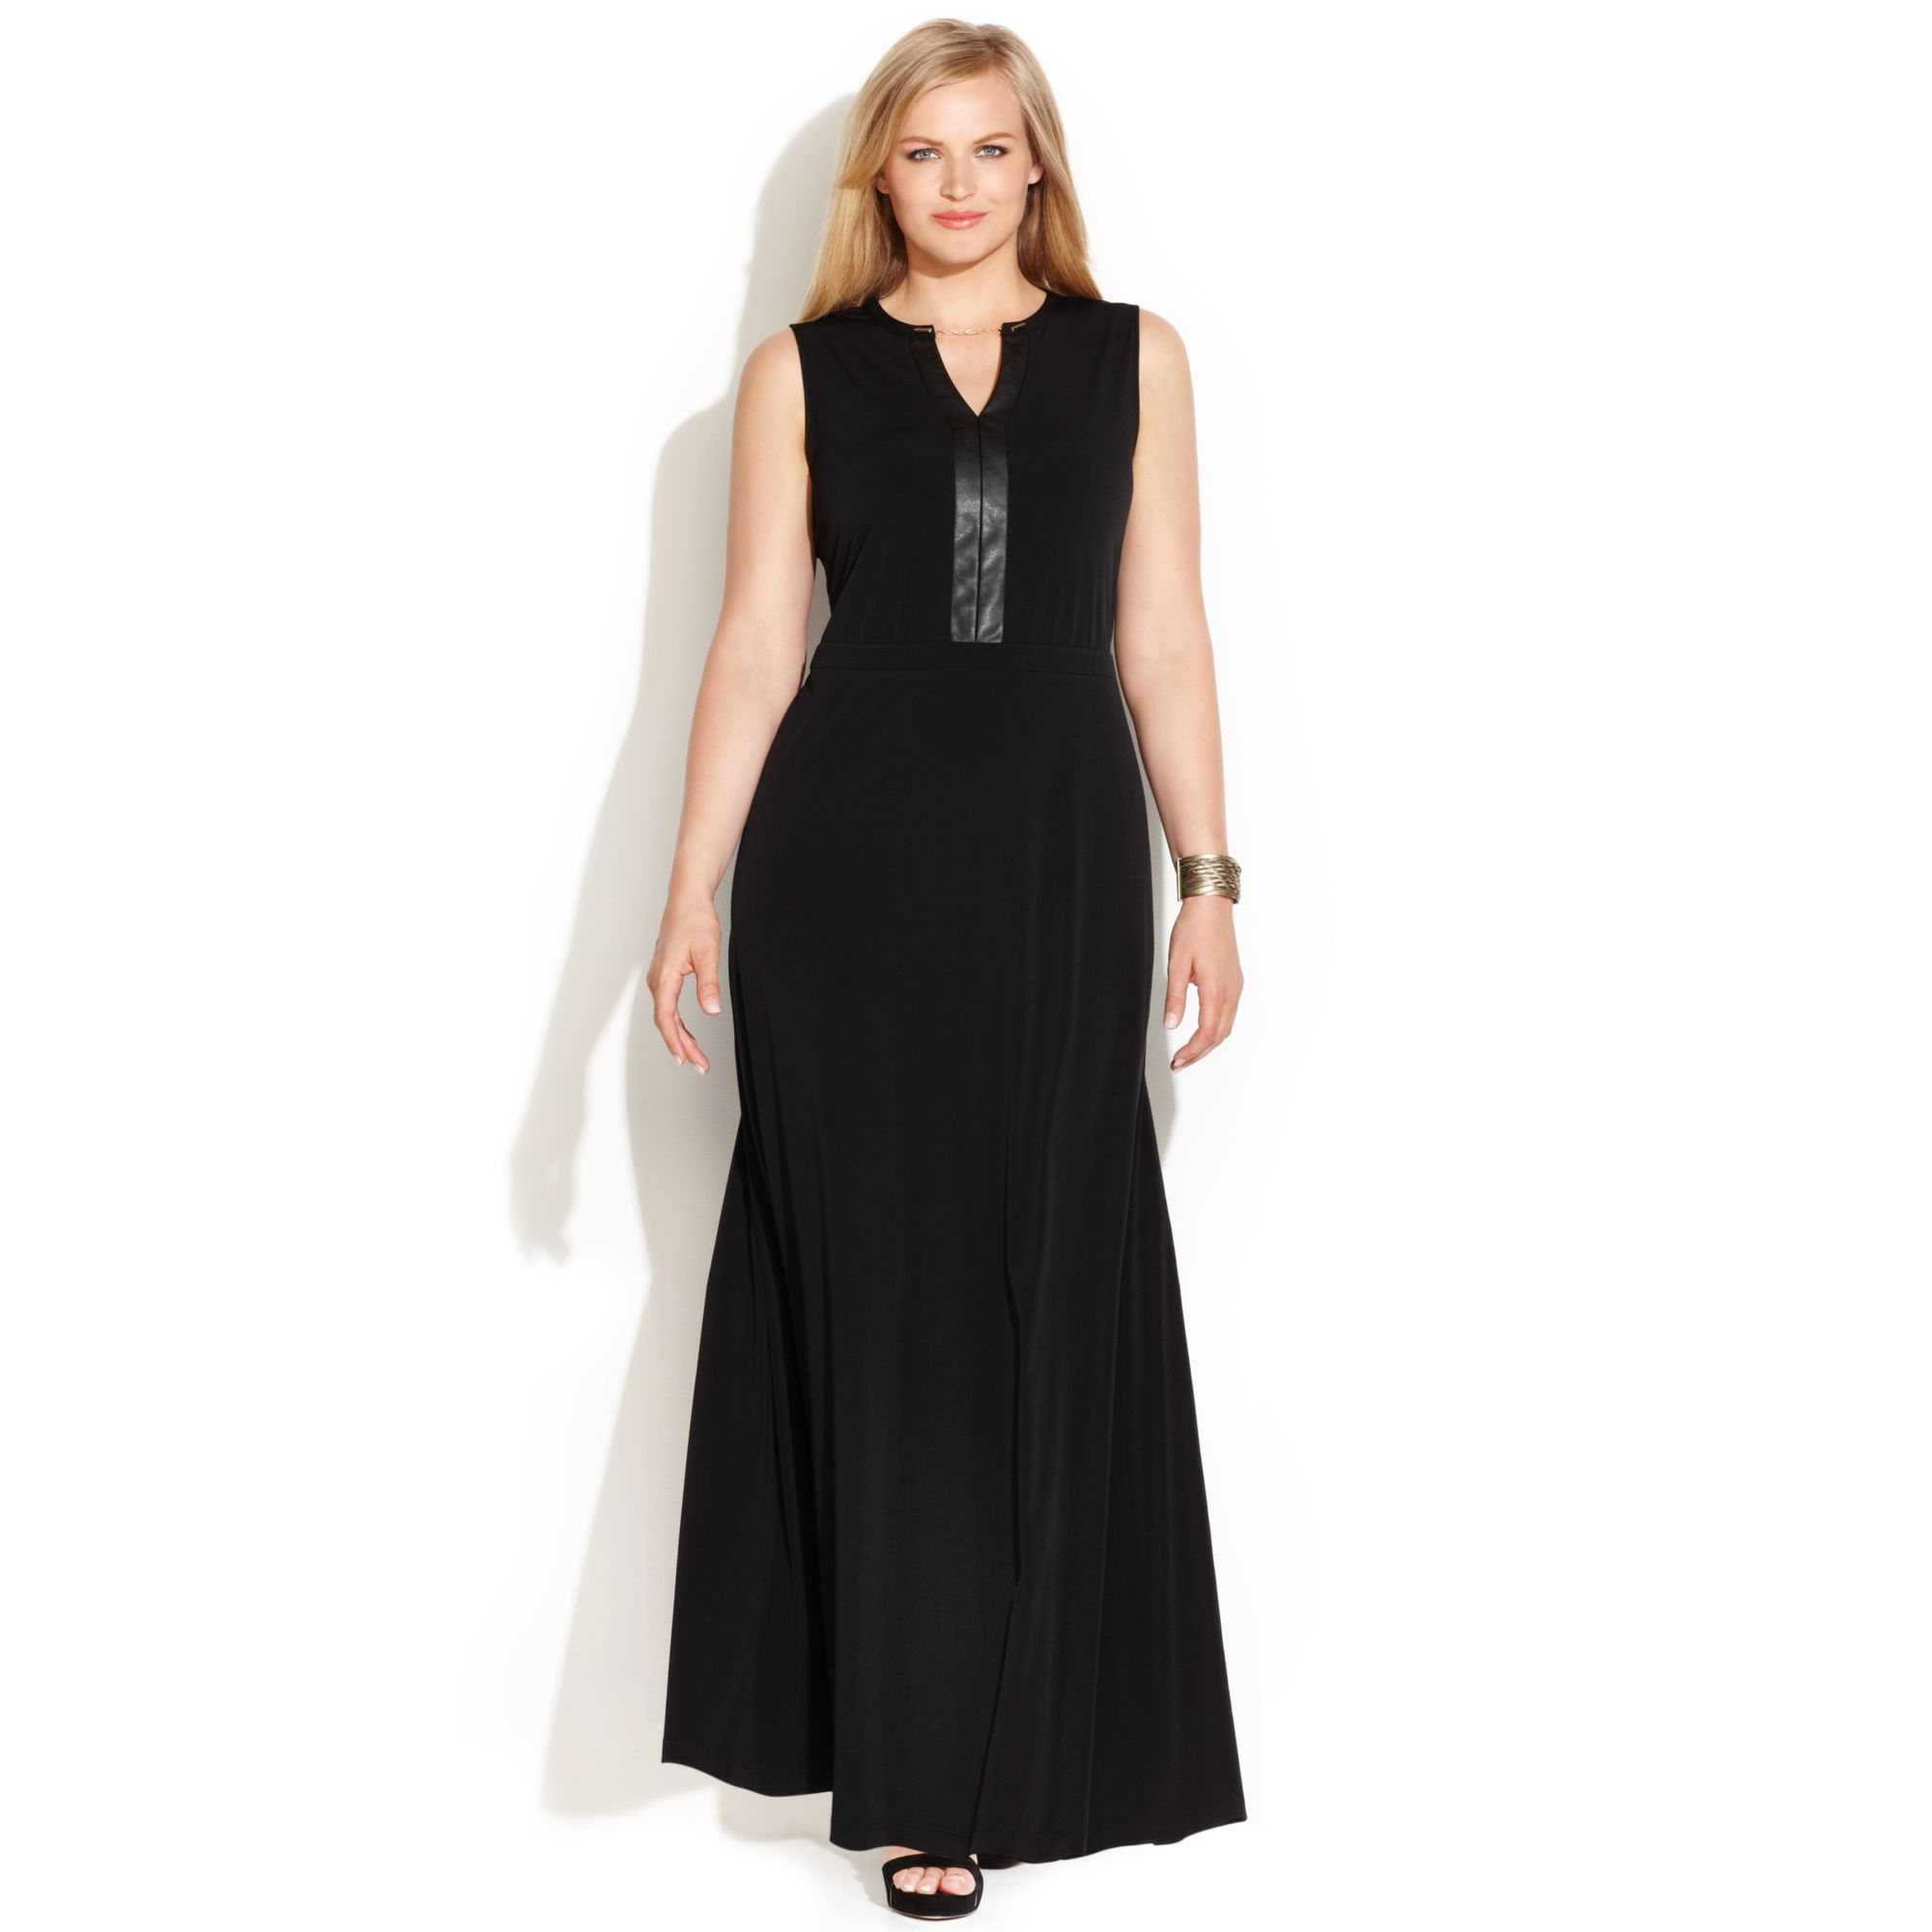 plus length dresses 3x-4x